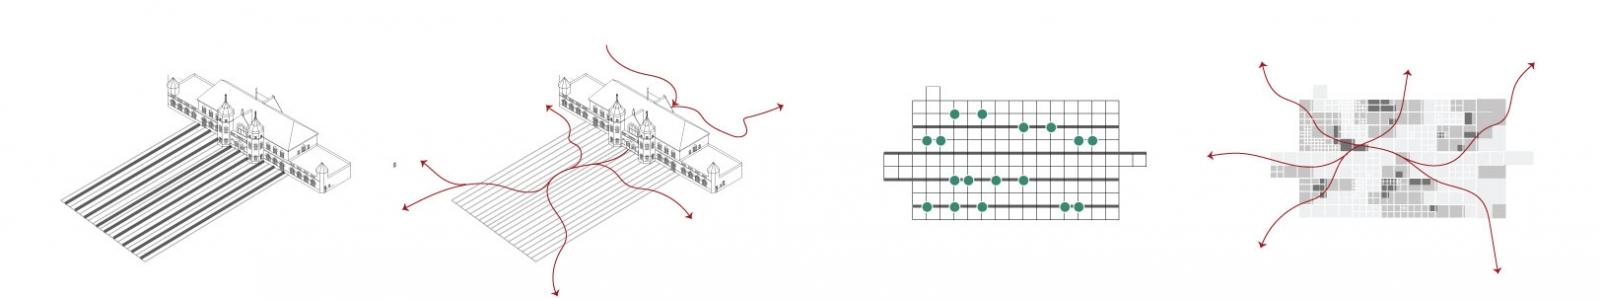 web_koncept1_esbjergs-banegaard